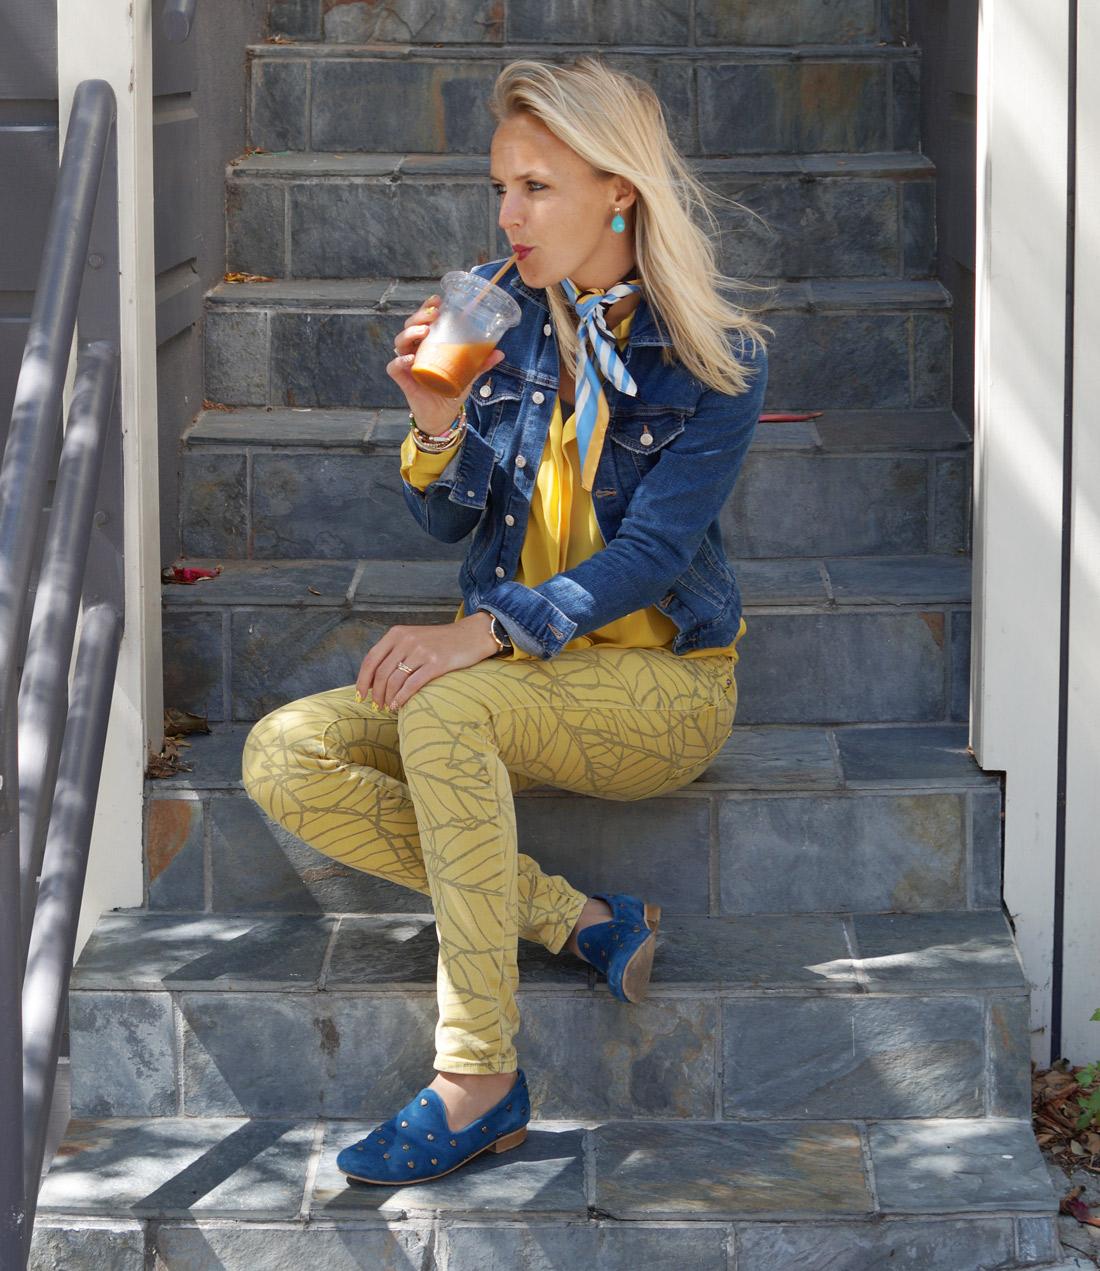 Bag-at-you---City-blog----Denim-Jacket-and-casual-wear